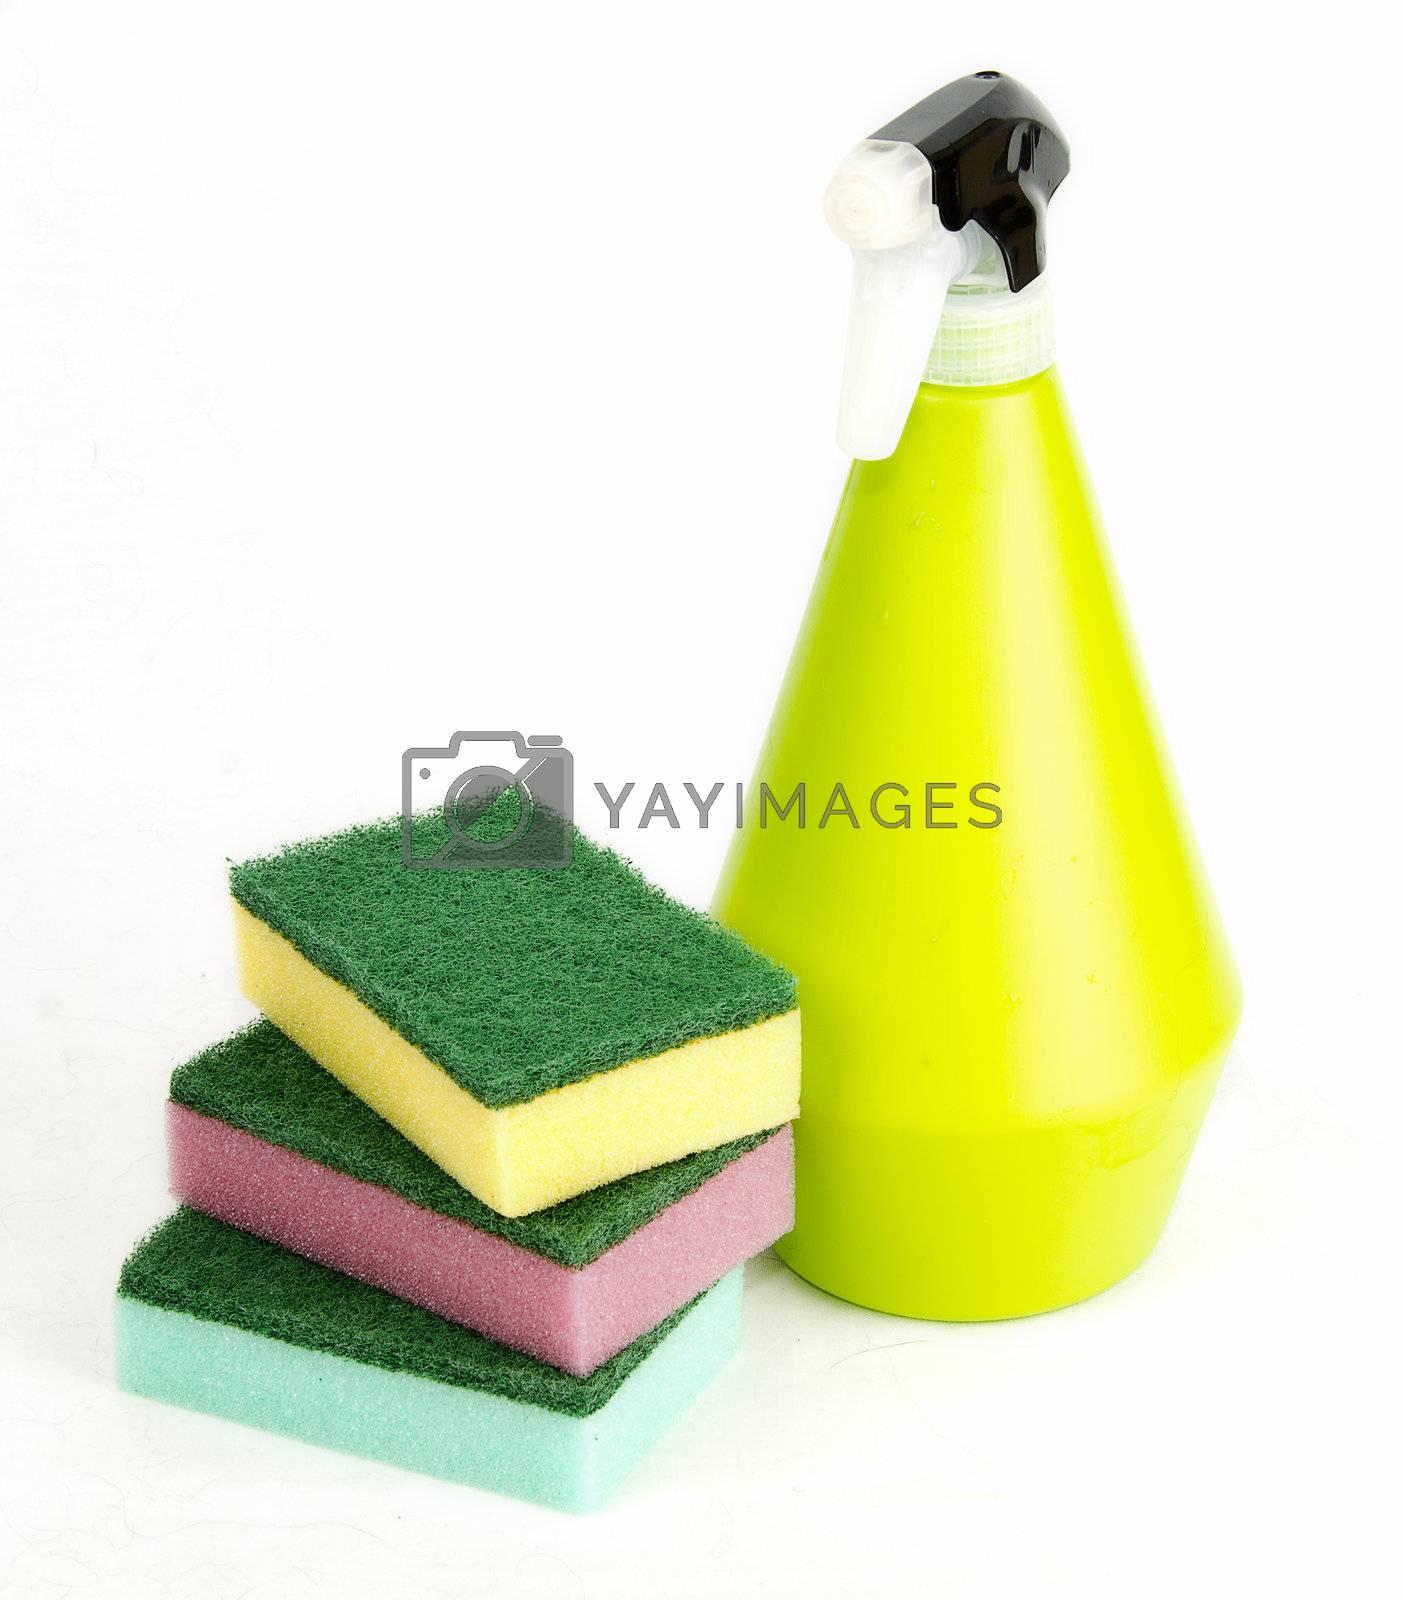 spunge and spray